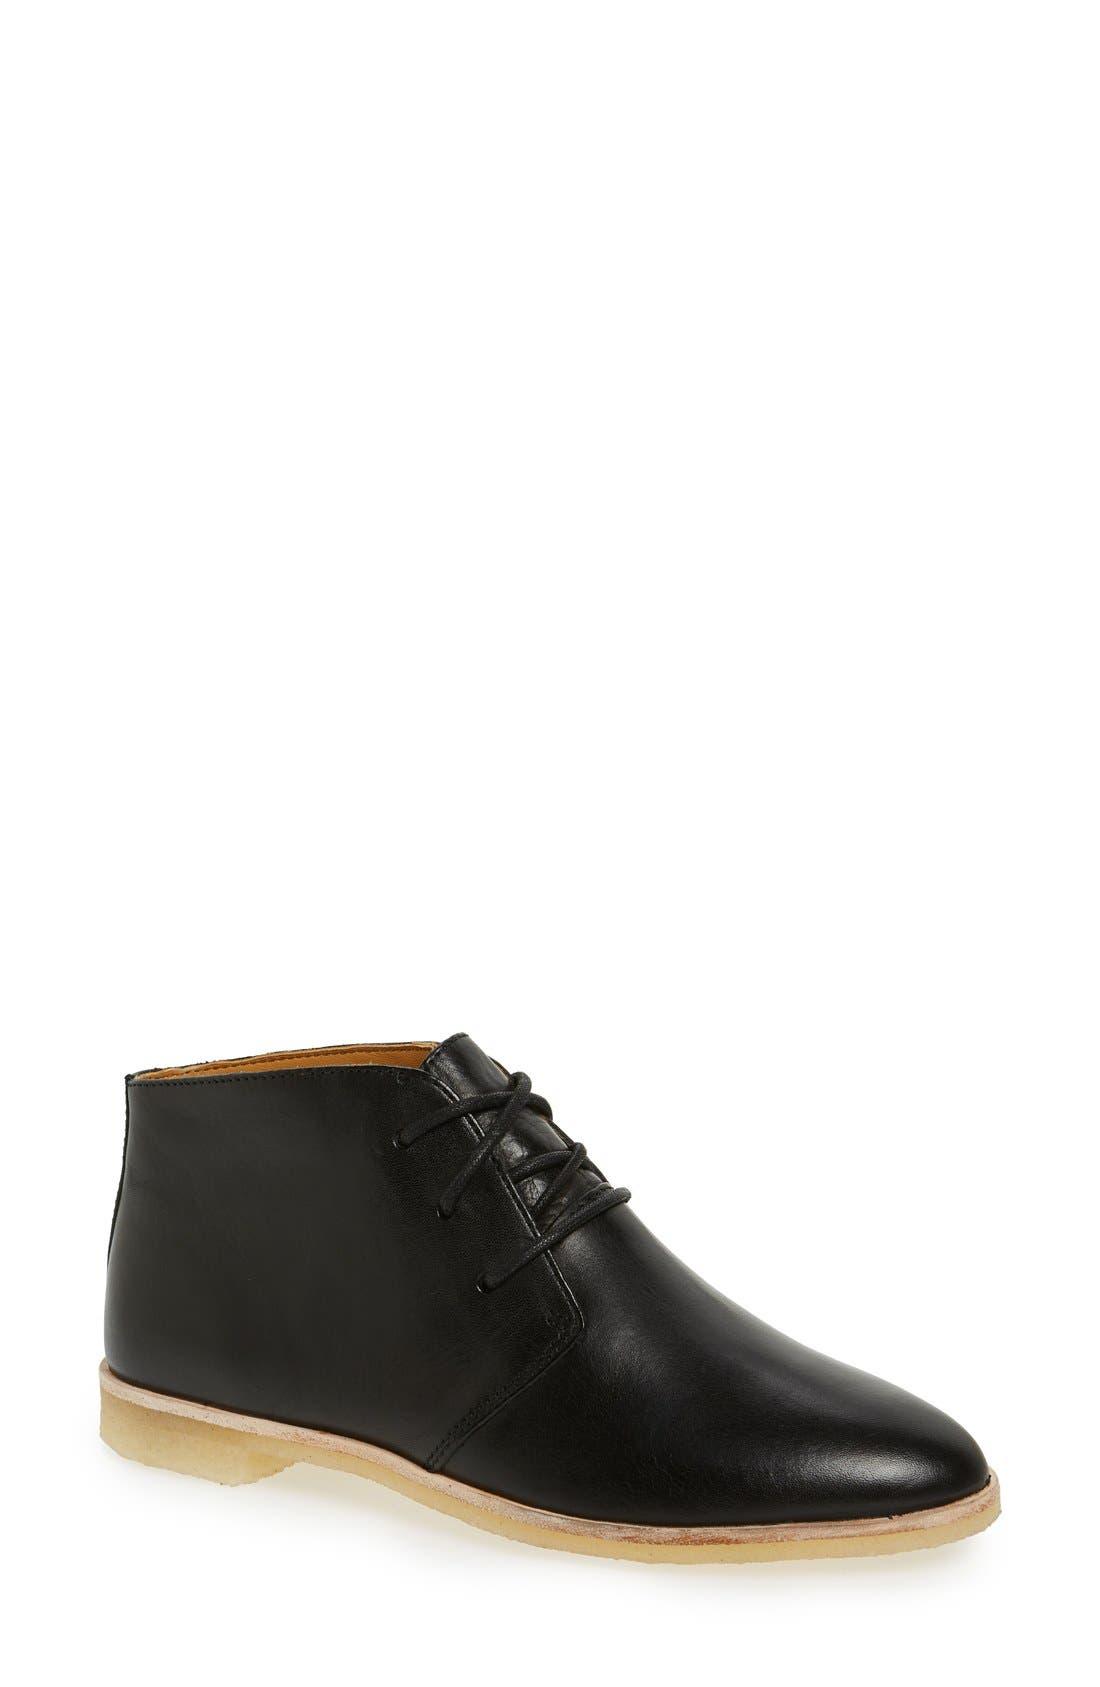 CLARKS<SUP>®</SUP> 'Phenia' Desert Boot, Main, color, 003